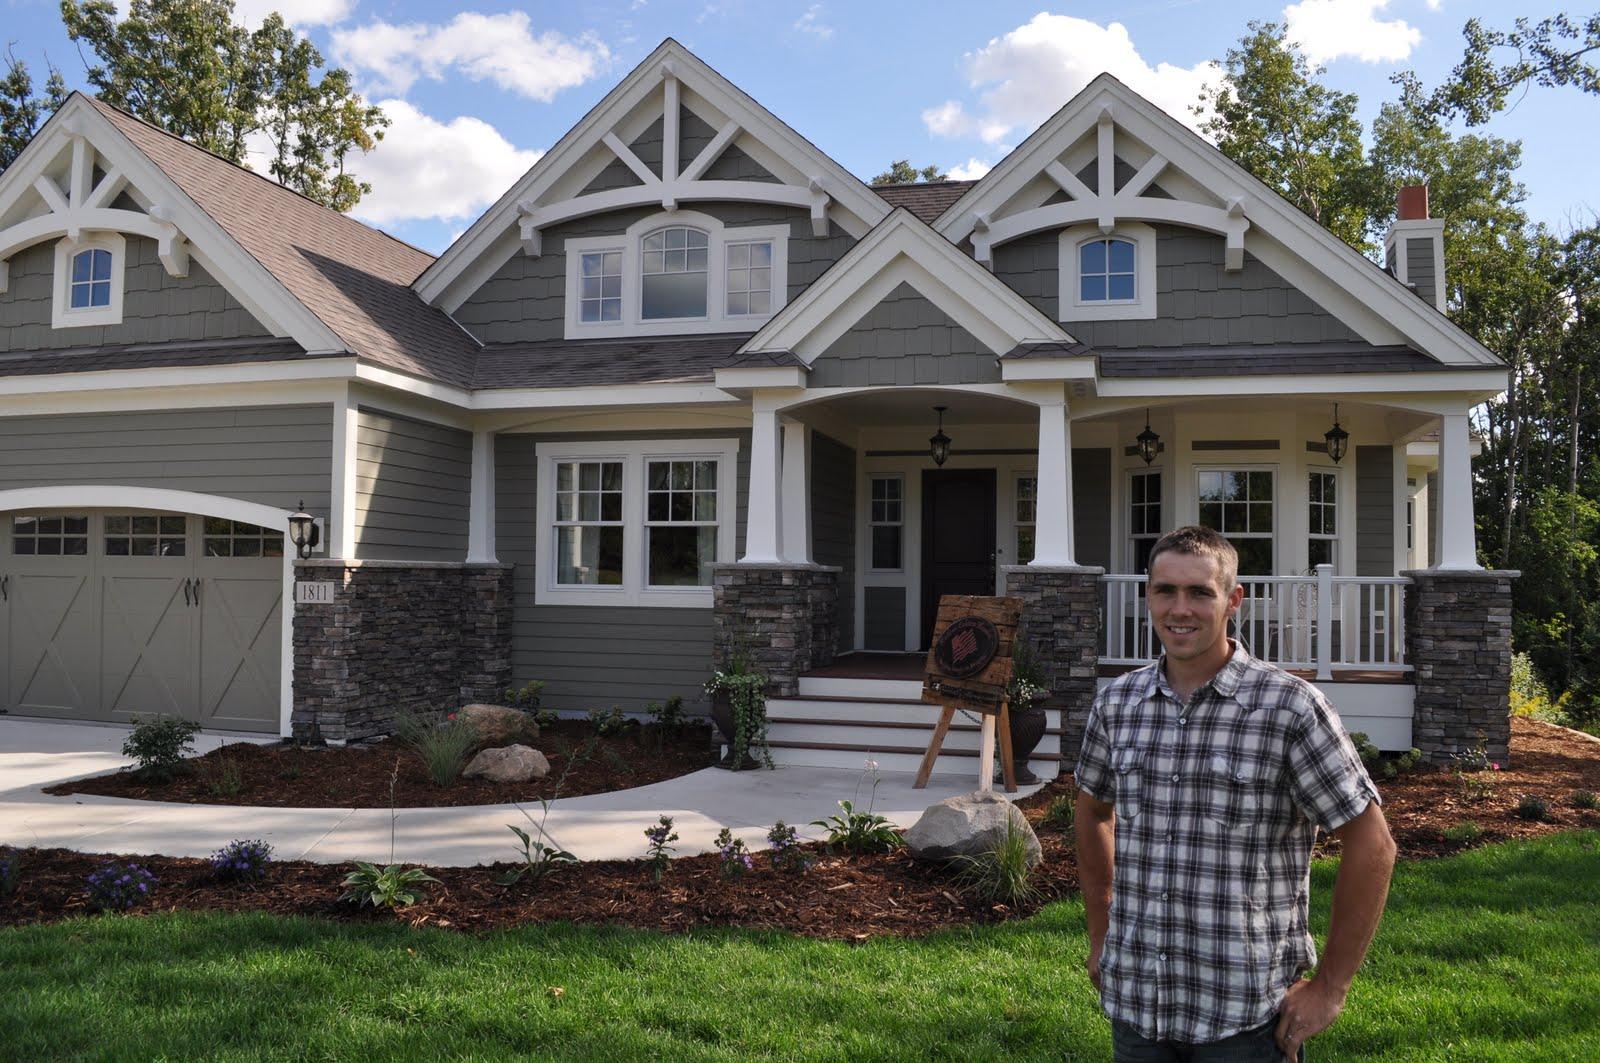 Ranch - Rambler Floor Plans - Brandl Anderson Homes - New Home